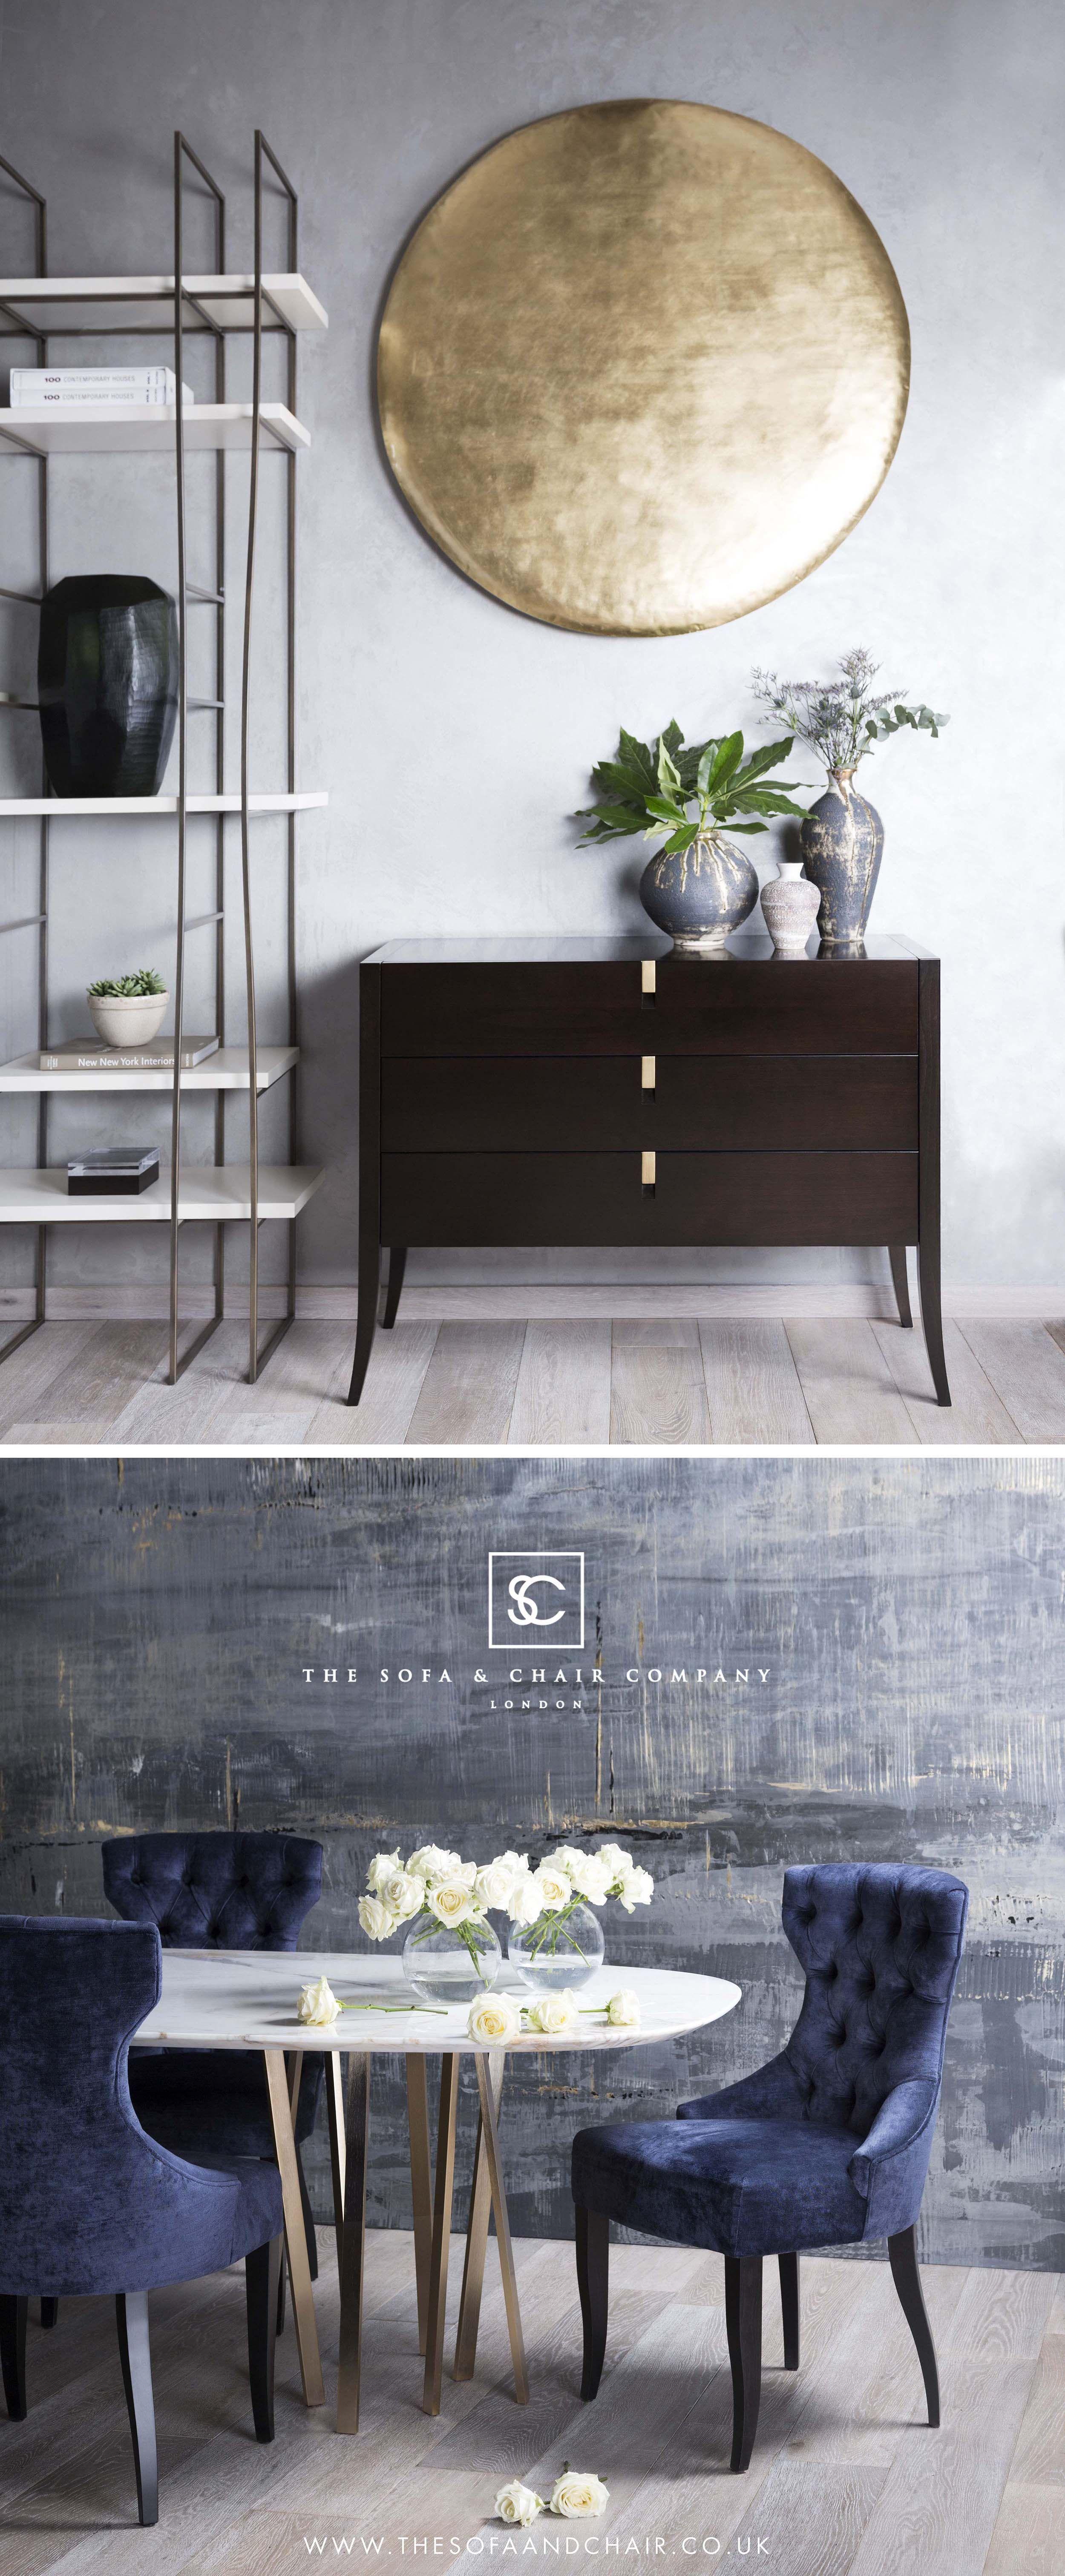 5 astounding tips furniture design rustic modern furniture inspiration metal furniture table antique furniture bar retro furniture makeovers